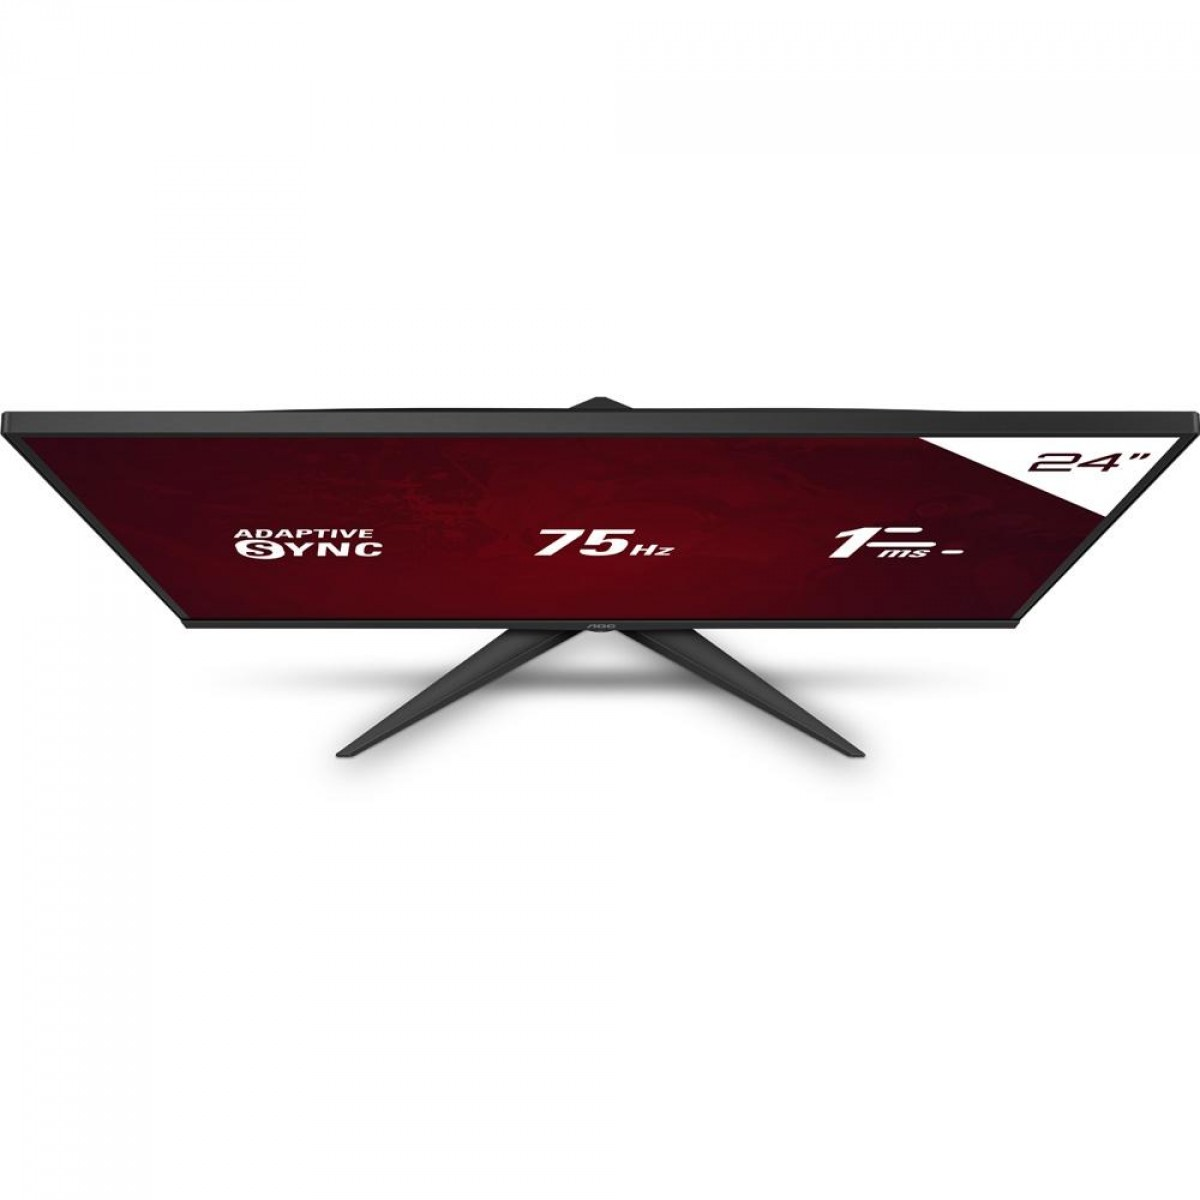 Monitor Gamer AOC Speed, 24 Pol, FullHD, IPS, HDMI/VGA, 24G2HE5